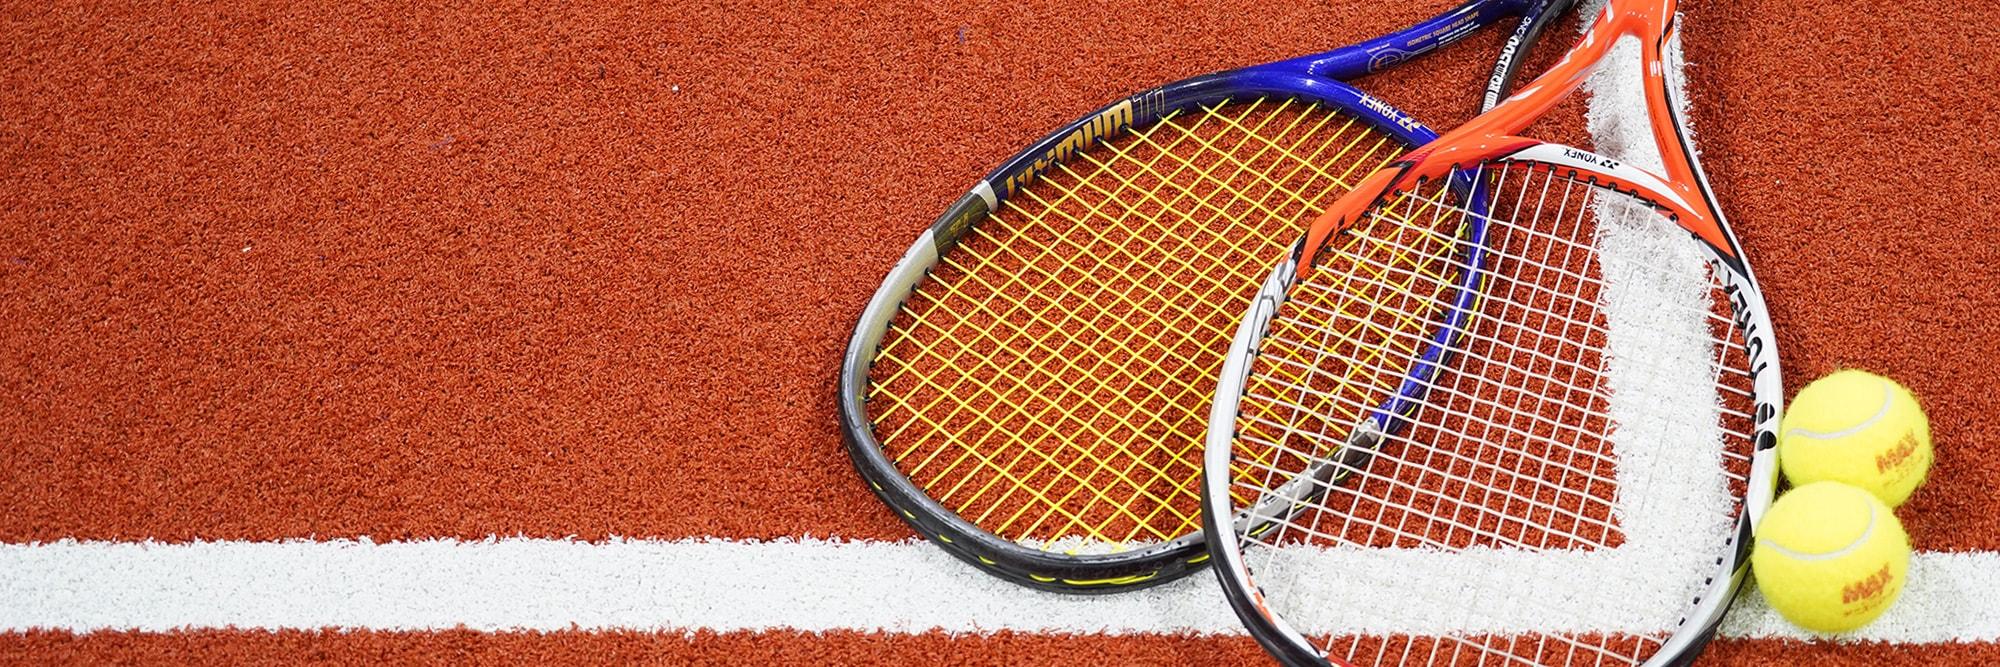 MAXインドアテニススクール|イベント案内|3/21 テニピン体験会